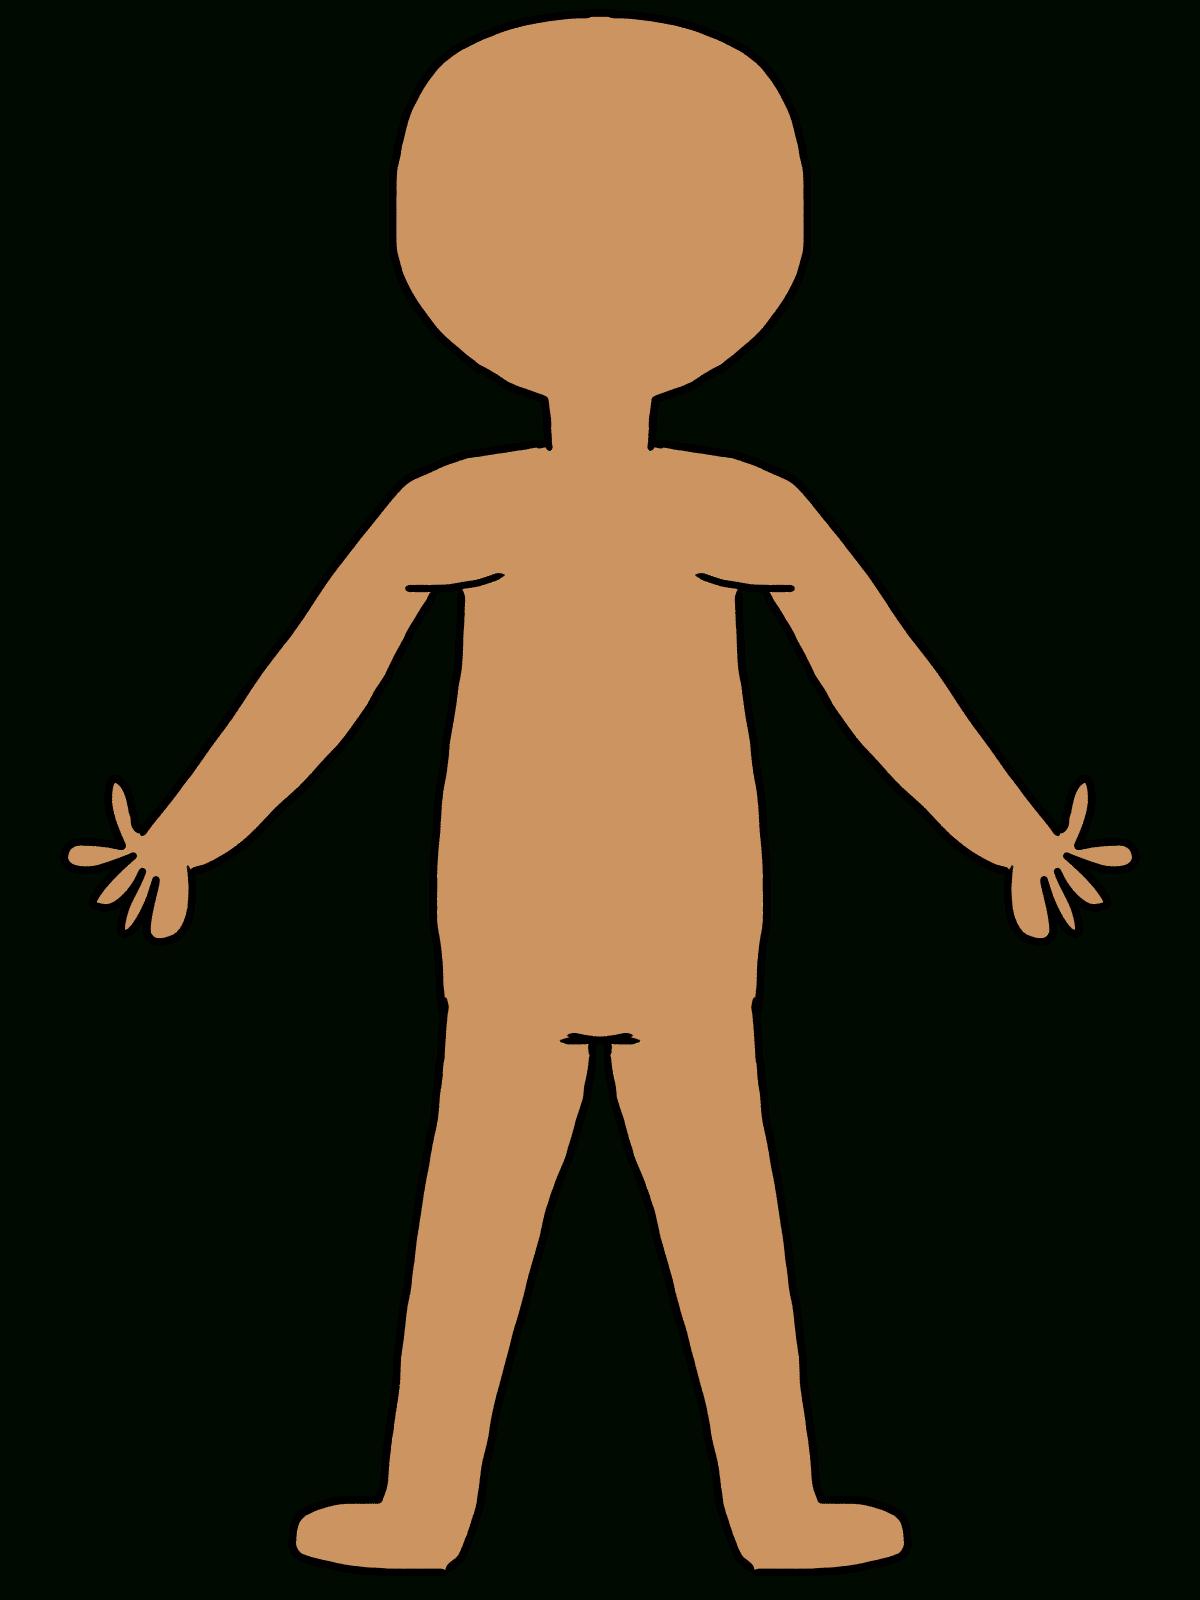 Human clipart human being, Human human being Transparent.